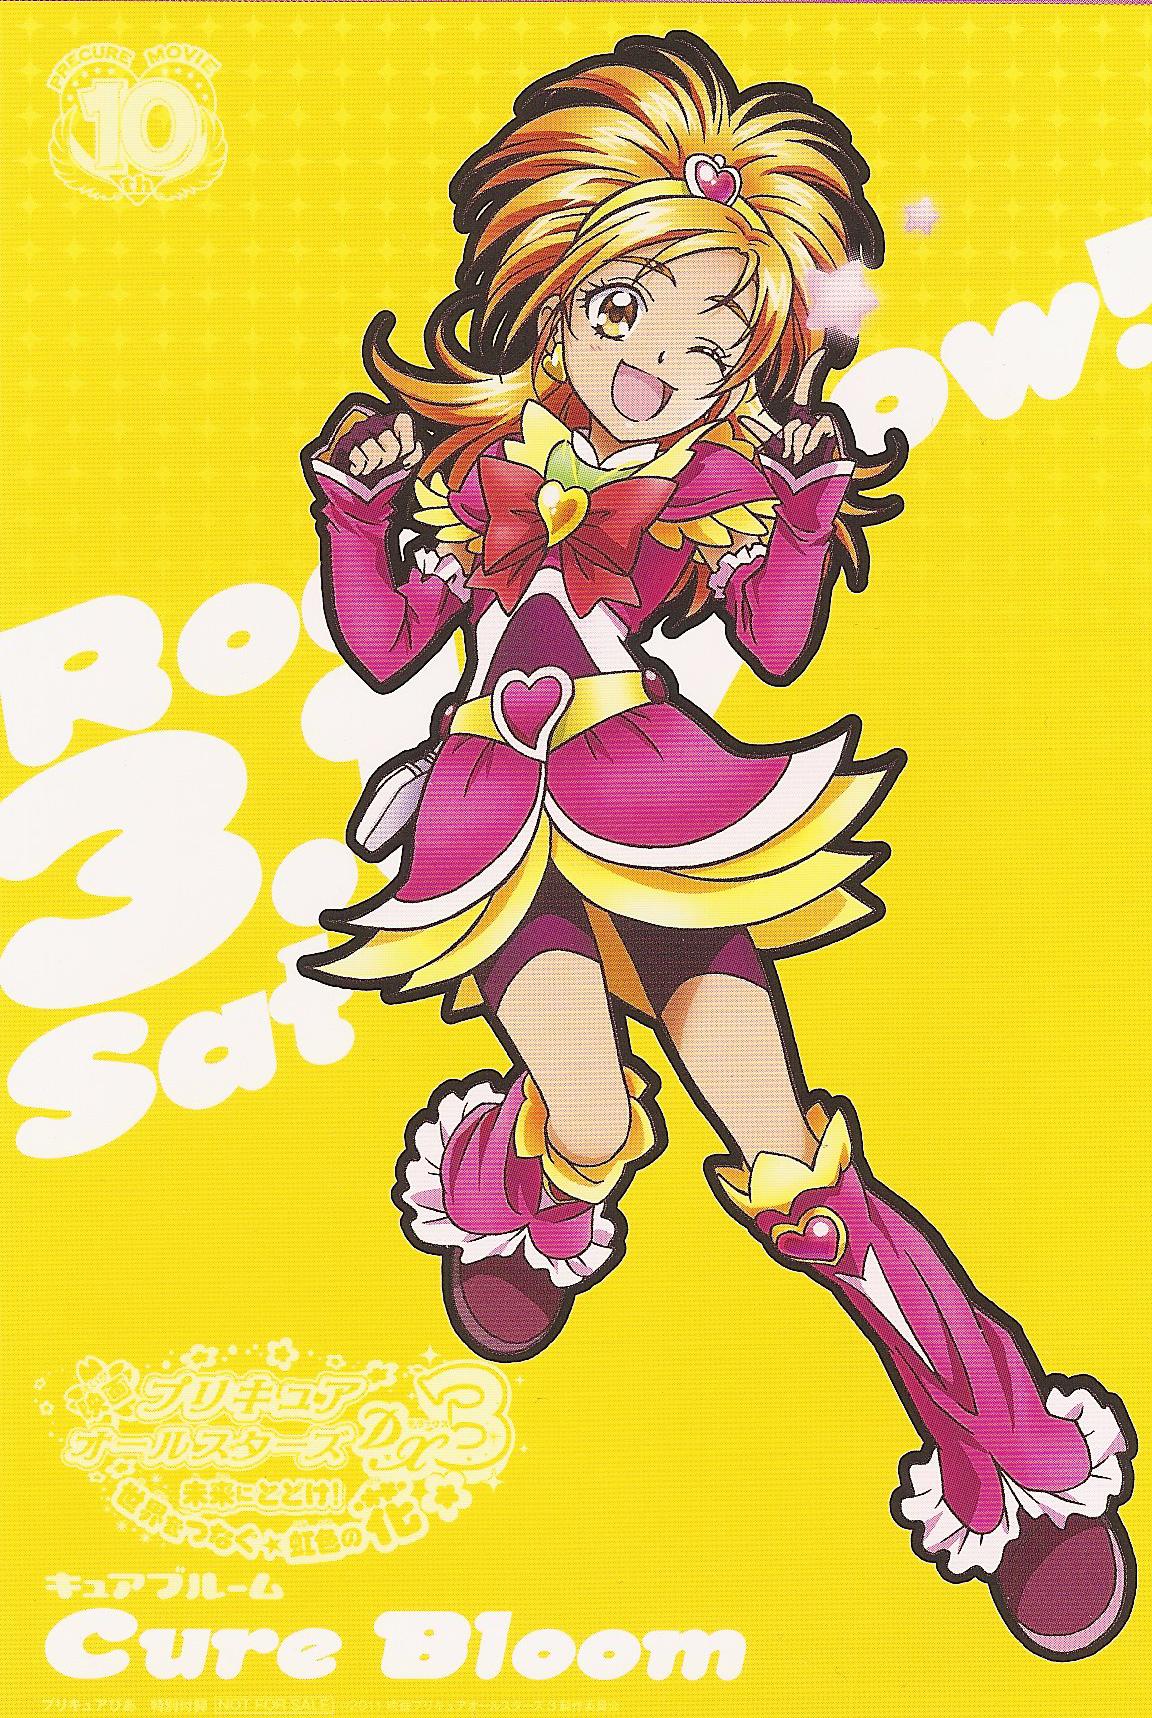 Cure Bloom Hyuuga Saki Image 878010 Zerochan Anime